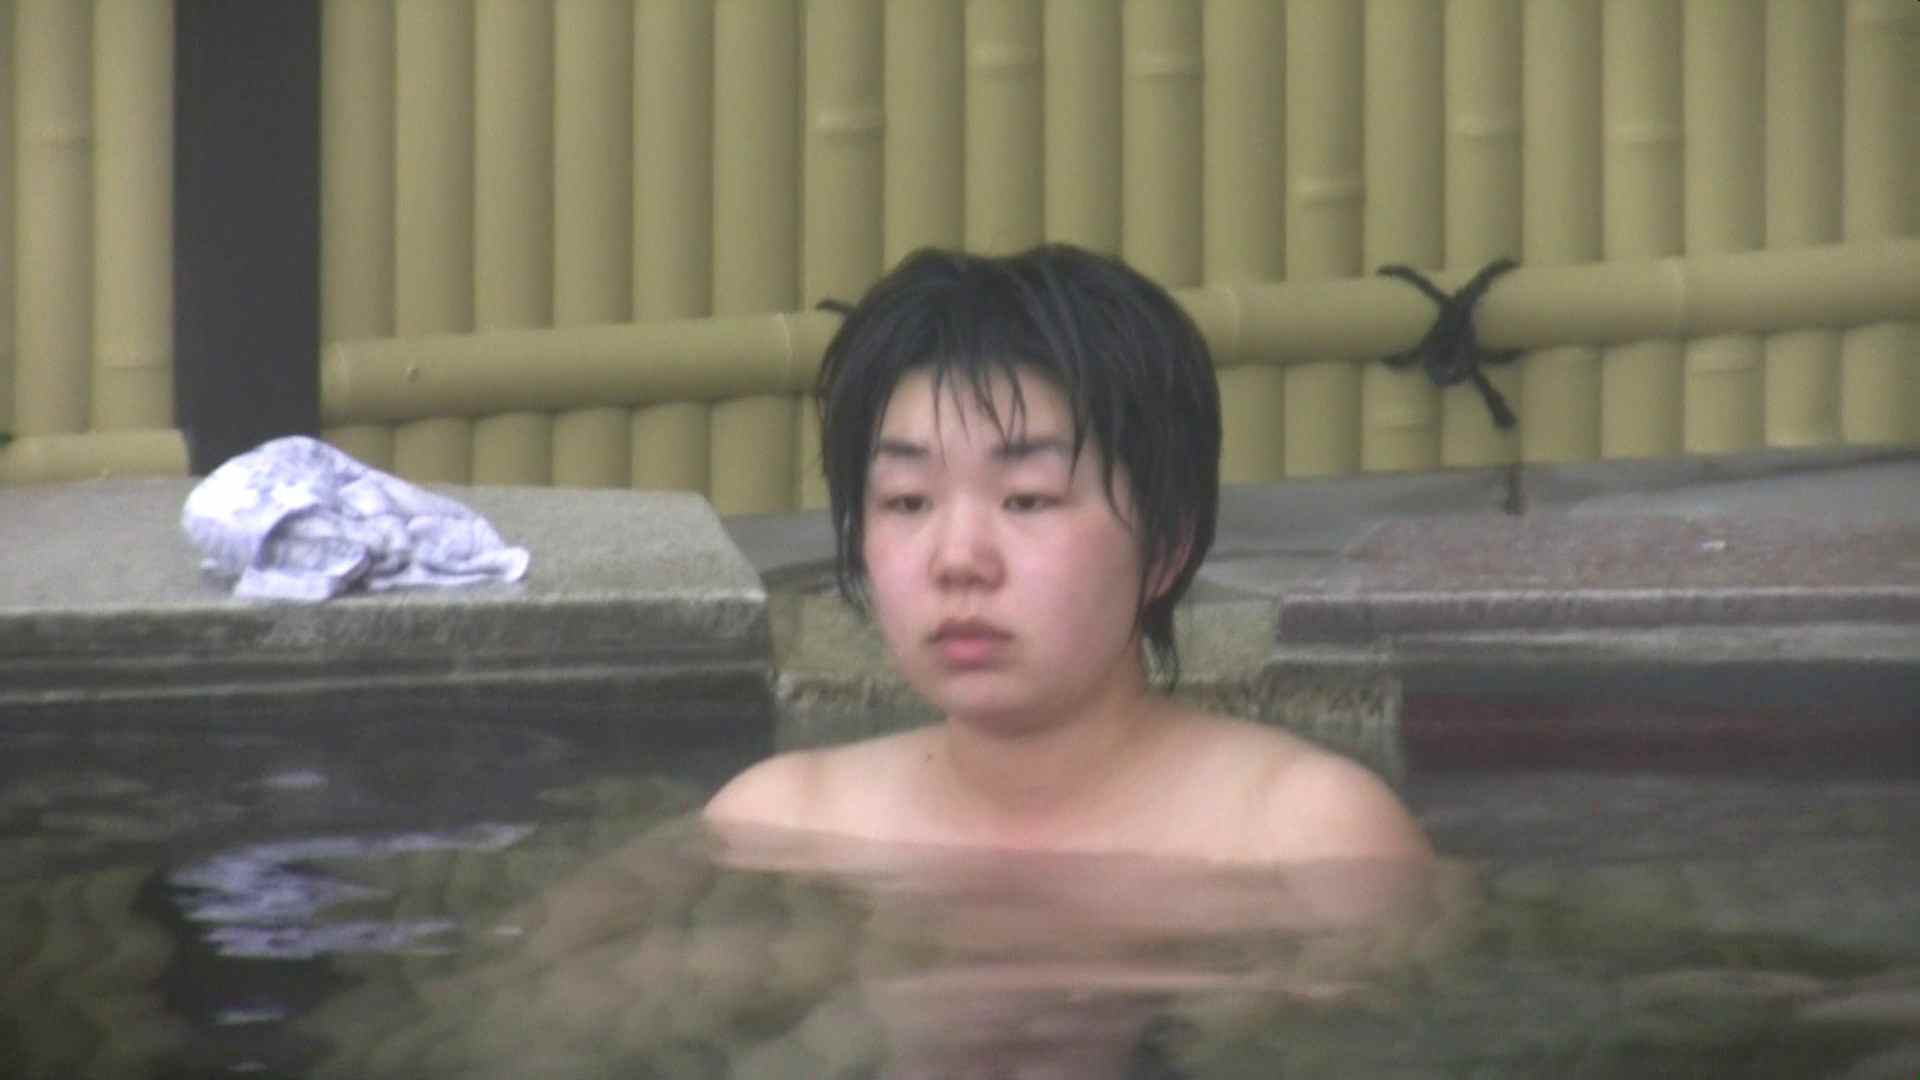 Aquaな露天風呂Vol.53【VIP限定】 盗撮師作品 おまんこ動画流出 78pic 17